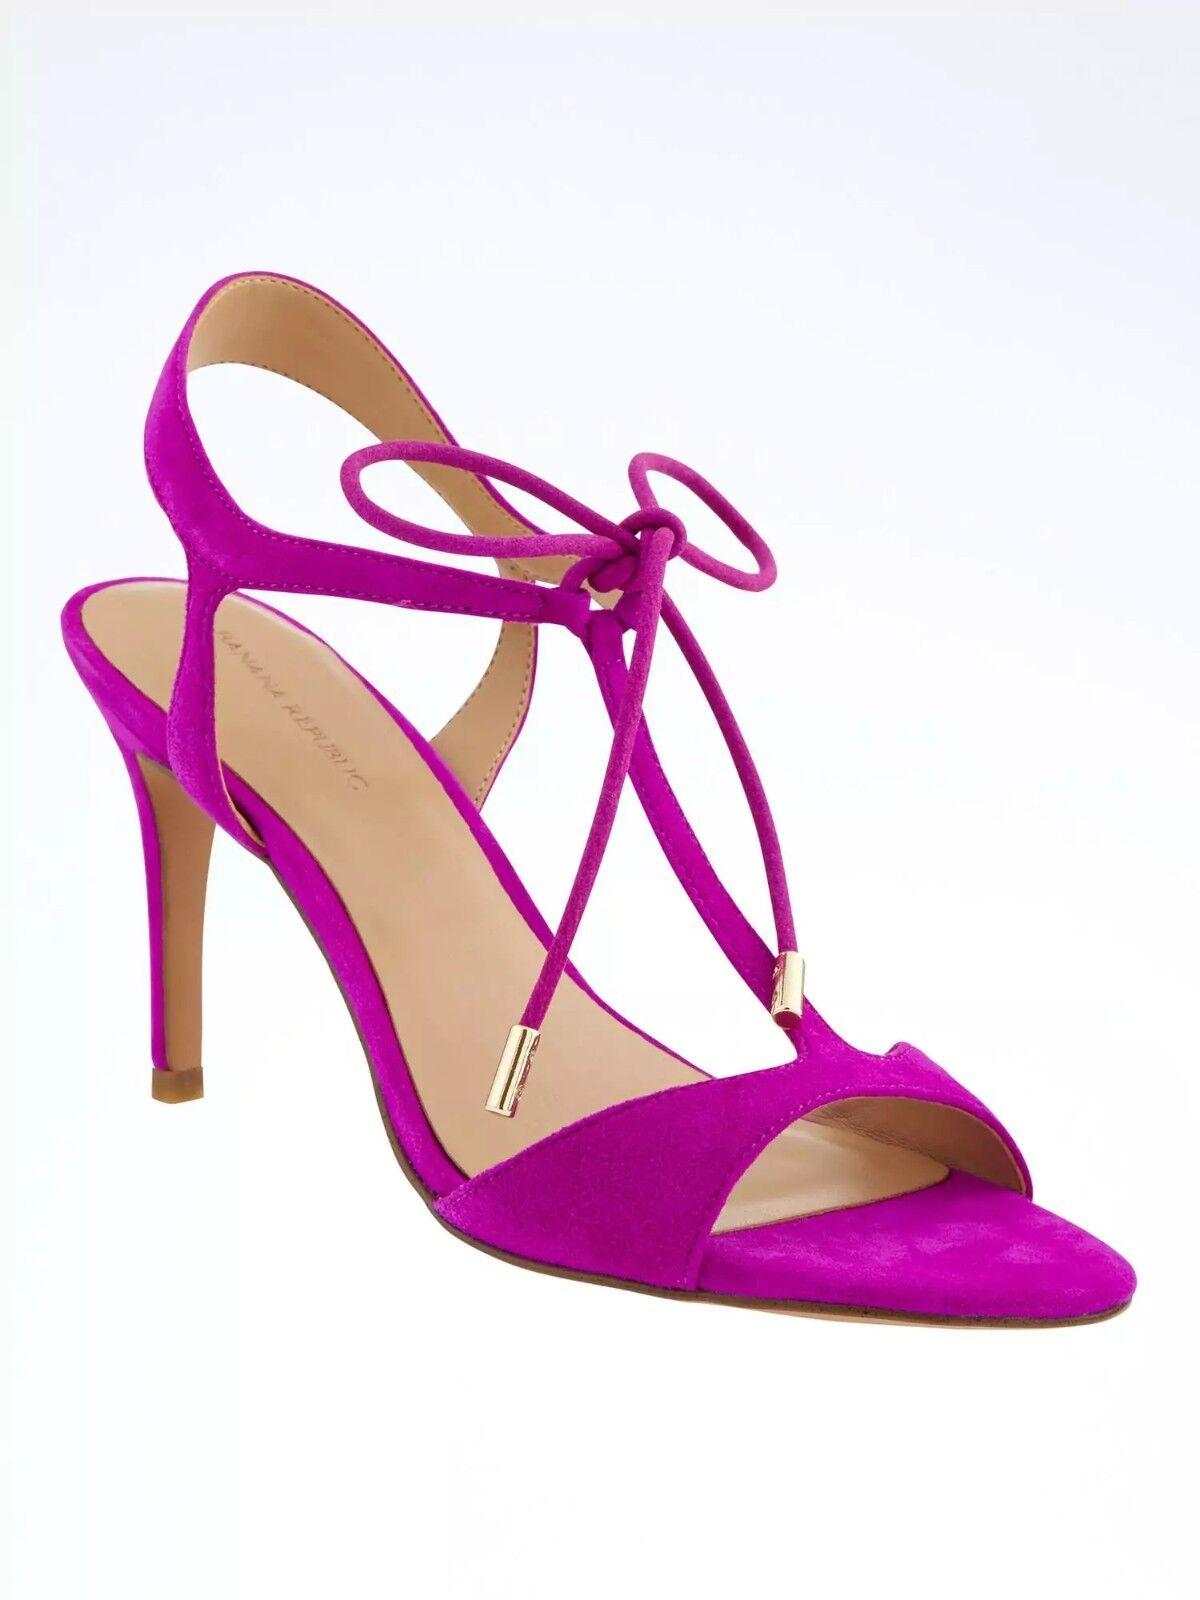 Banana Republic T-Strap High Heel Sandale,Neon Fuschia Suede SIZE 8 M  #683617 v5